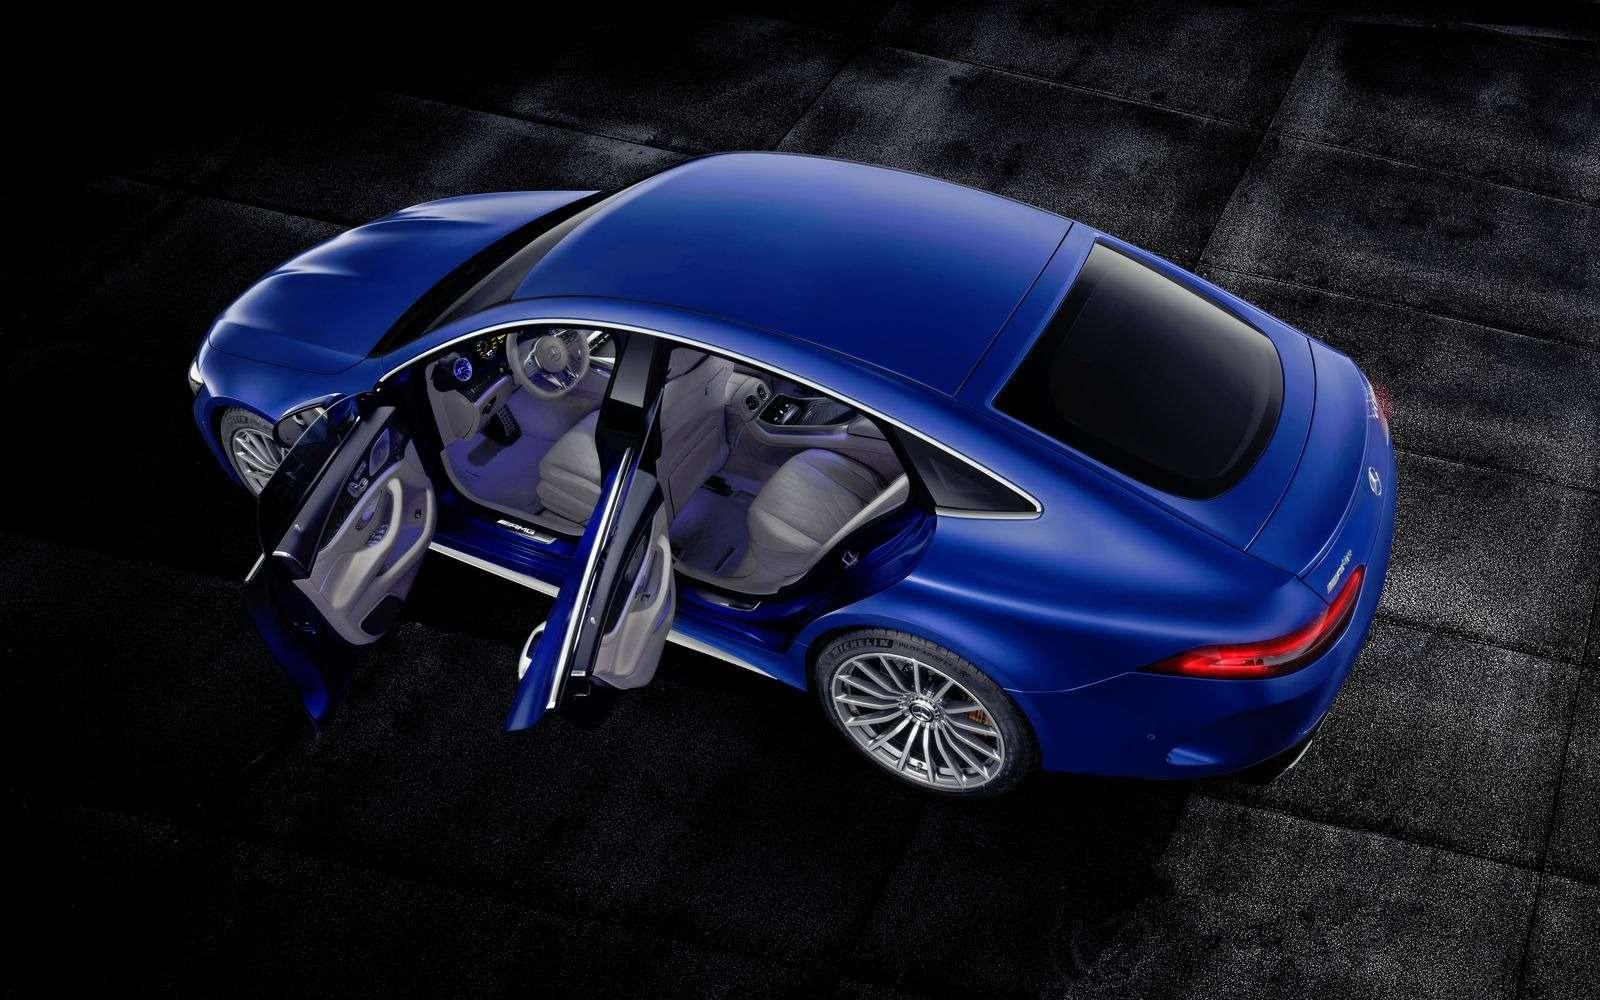 Подмена! Пятидверный Mercedes-AMG GTполучил «тележку» Е-класса— фото 851518